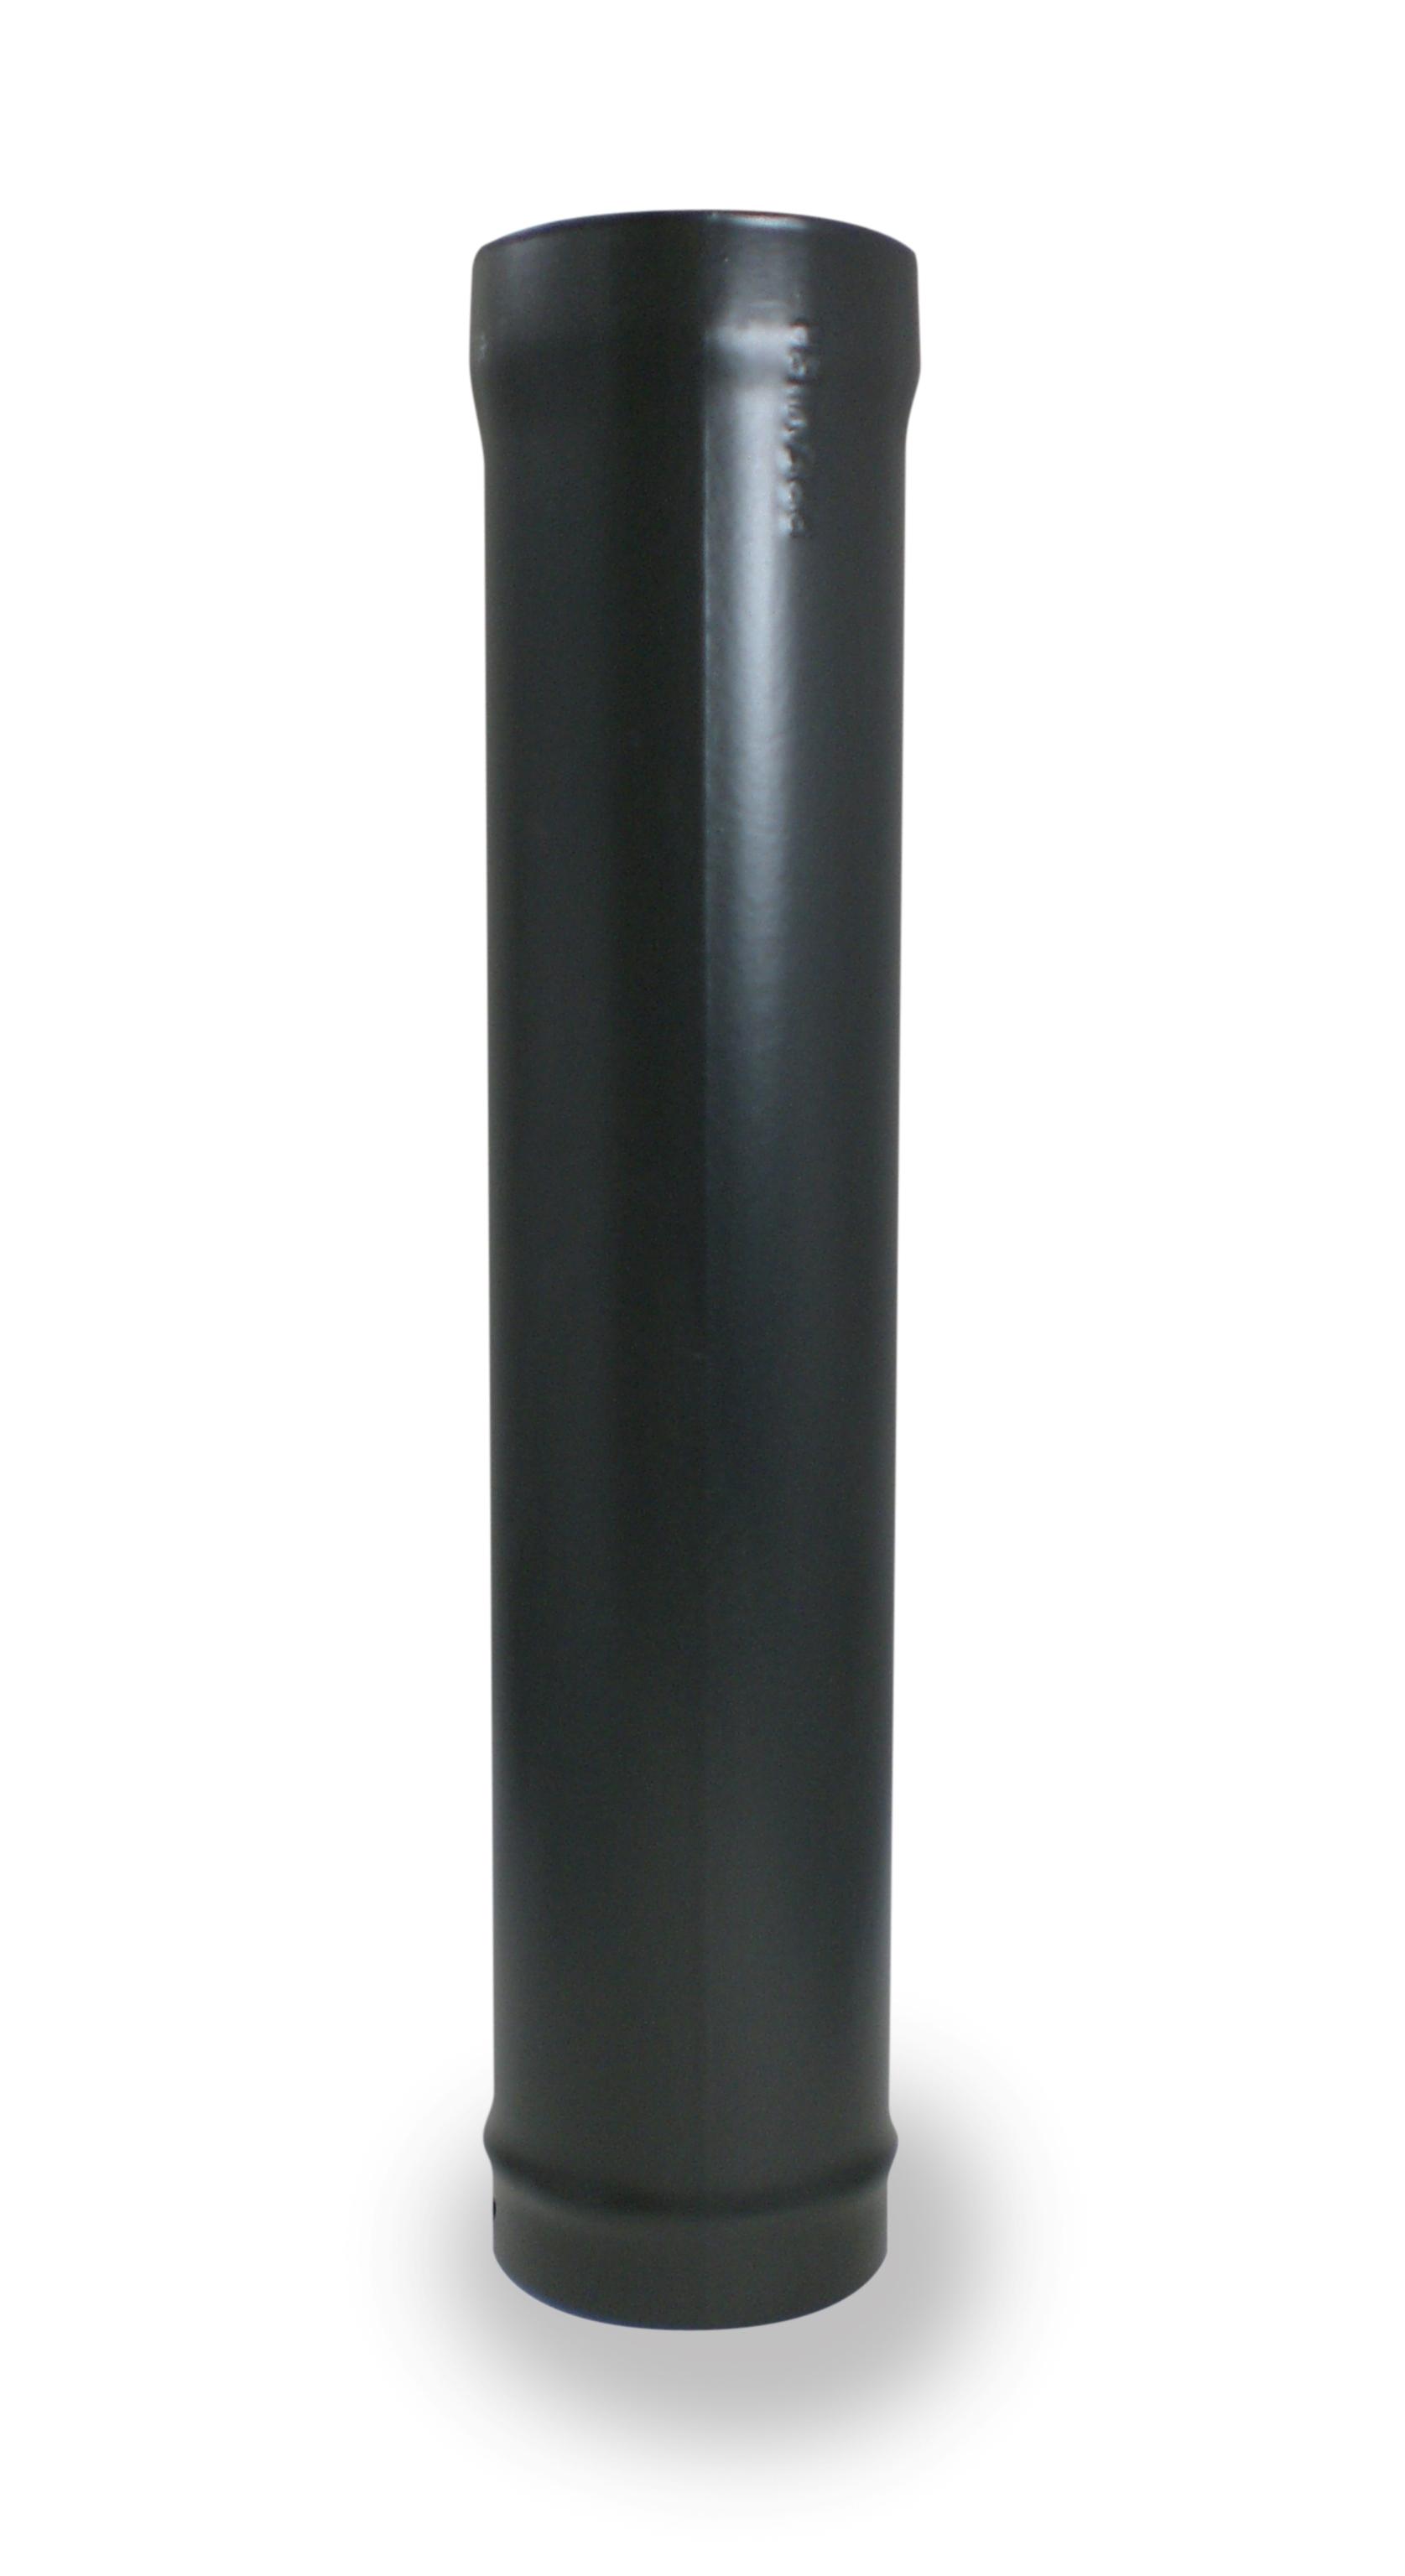 150mm (6